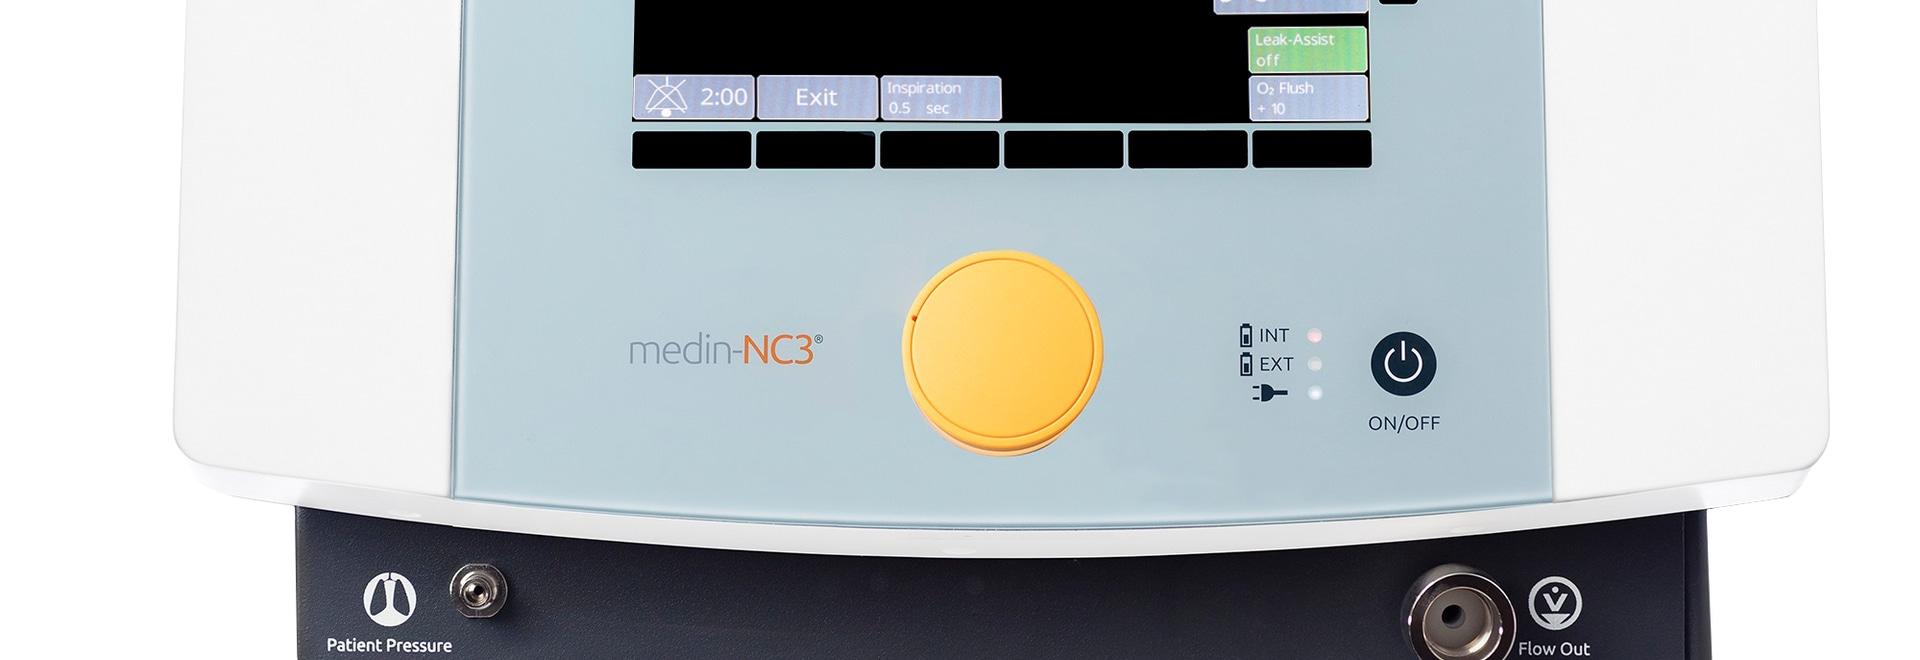 medin-NC3